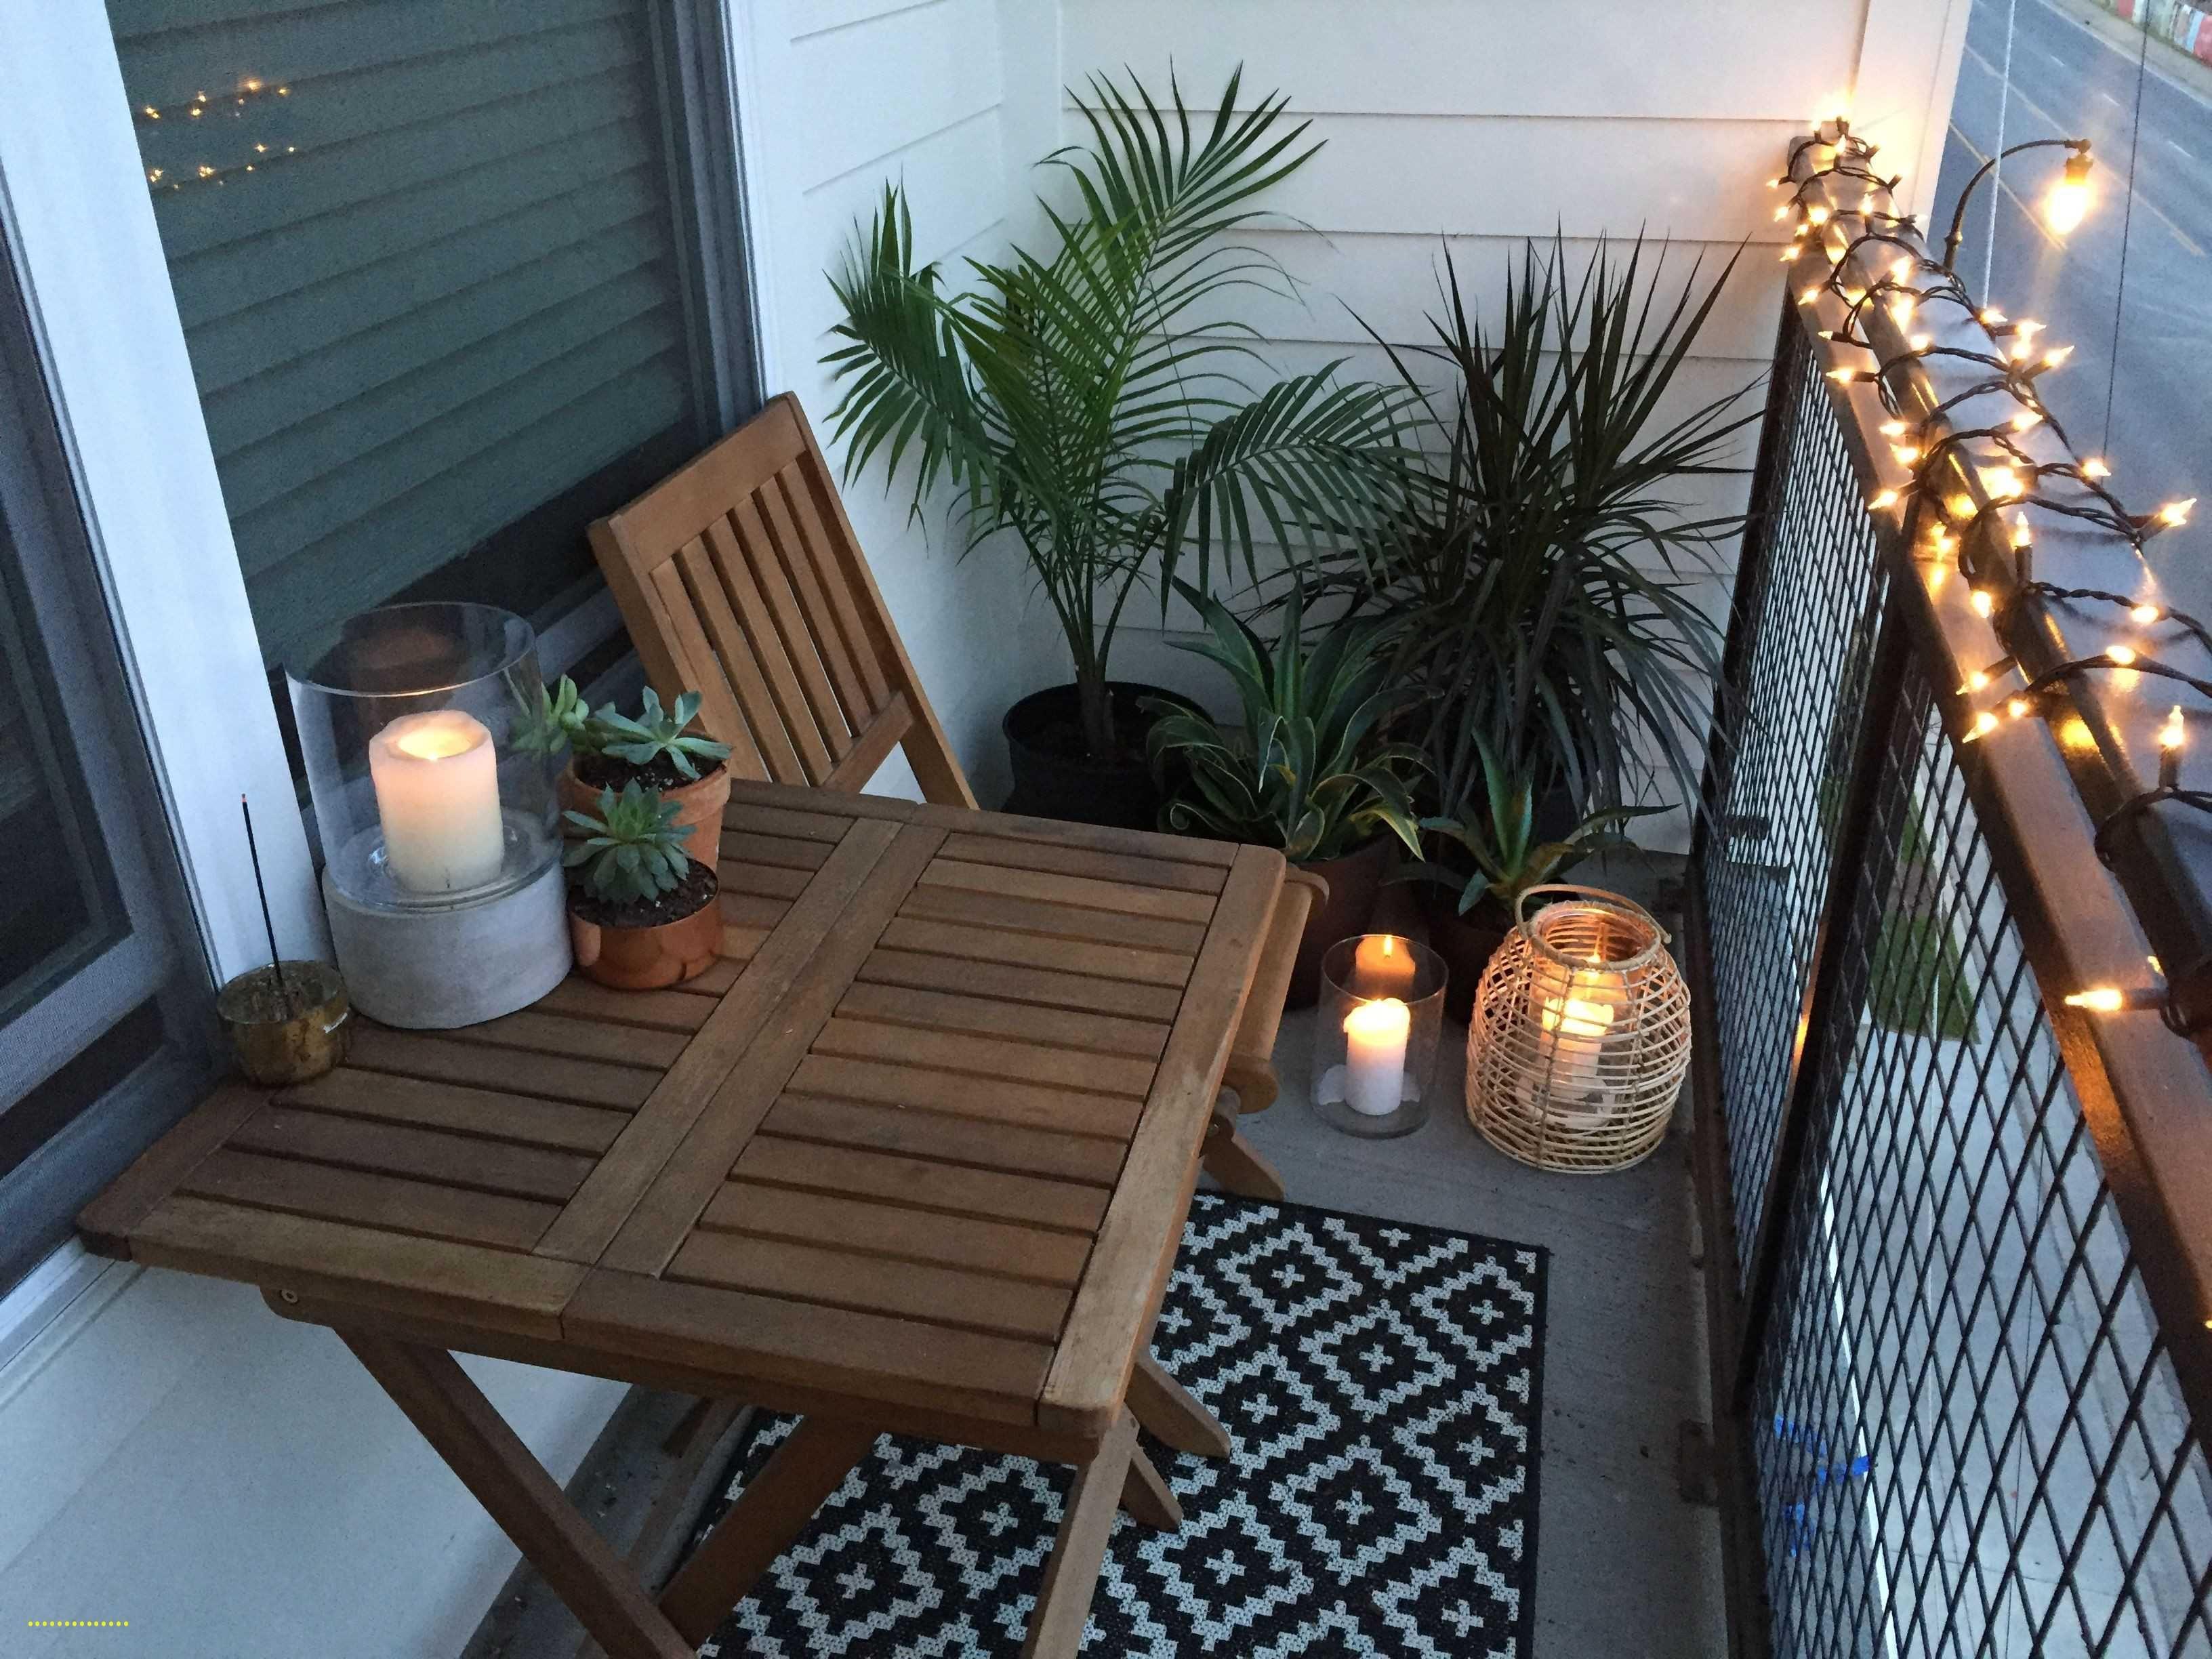 Prodigious Patio Decorating Ideas Small Balcony Garden